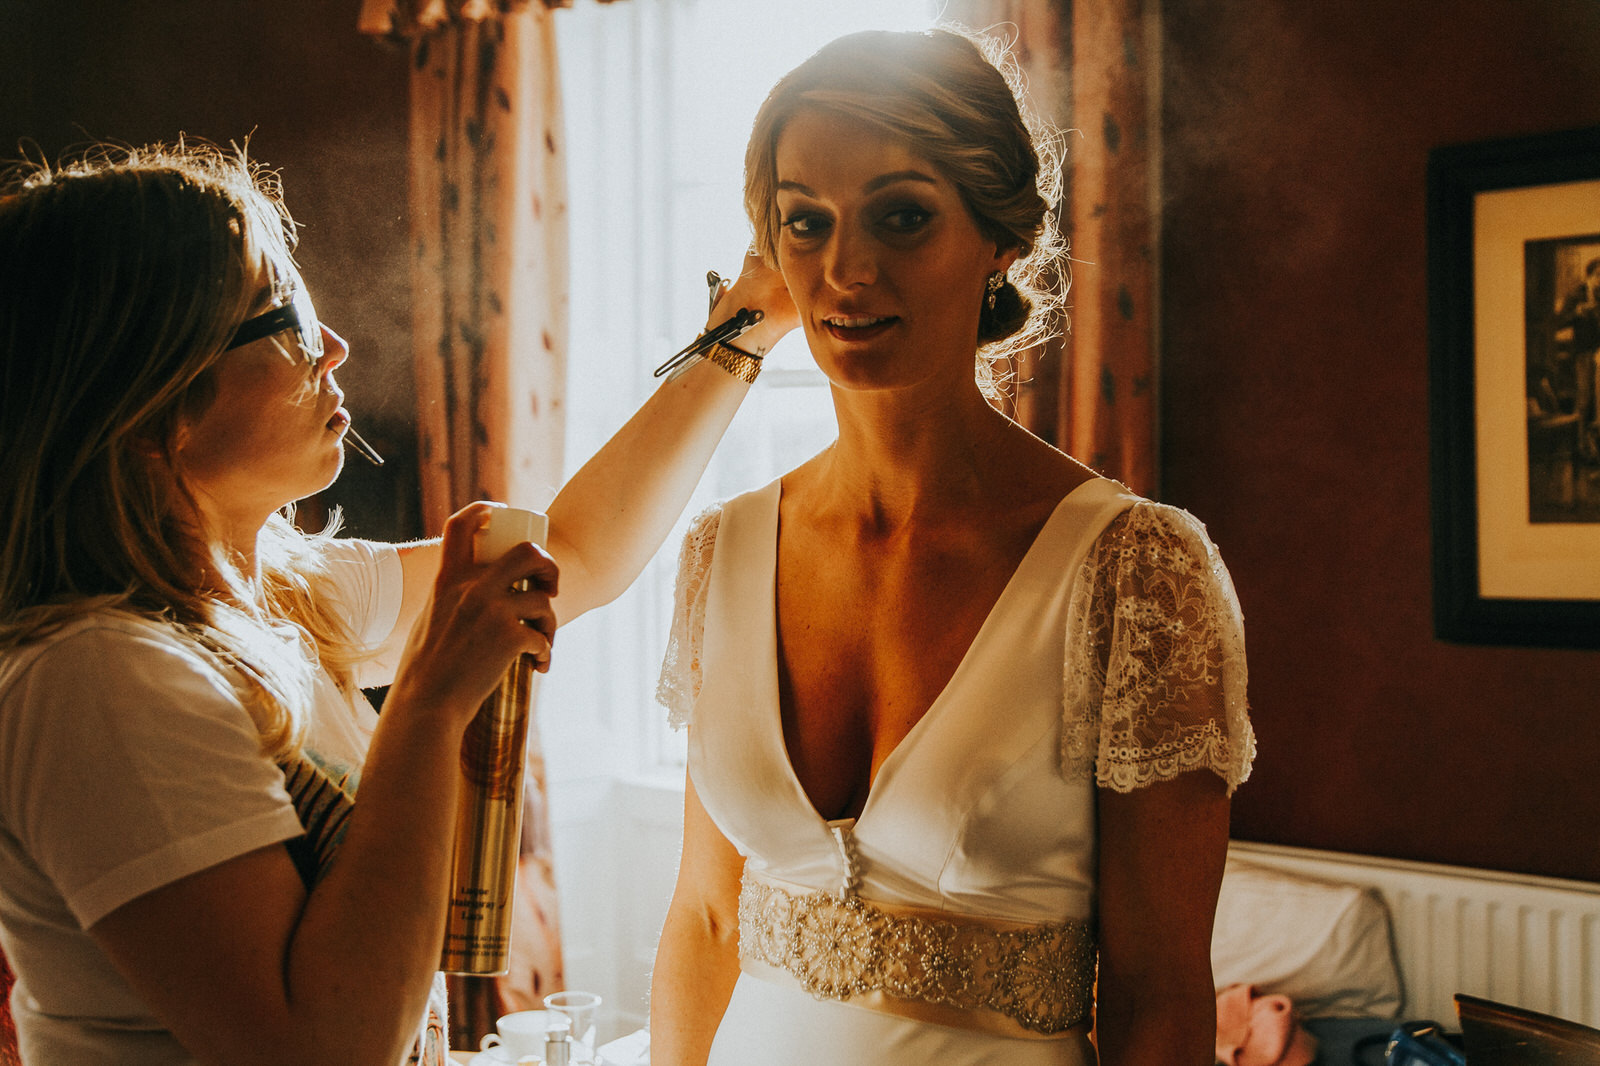 Dunbrody_House_Wedding_photographer_044.jpg